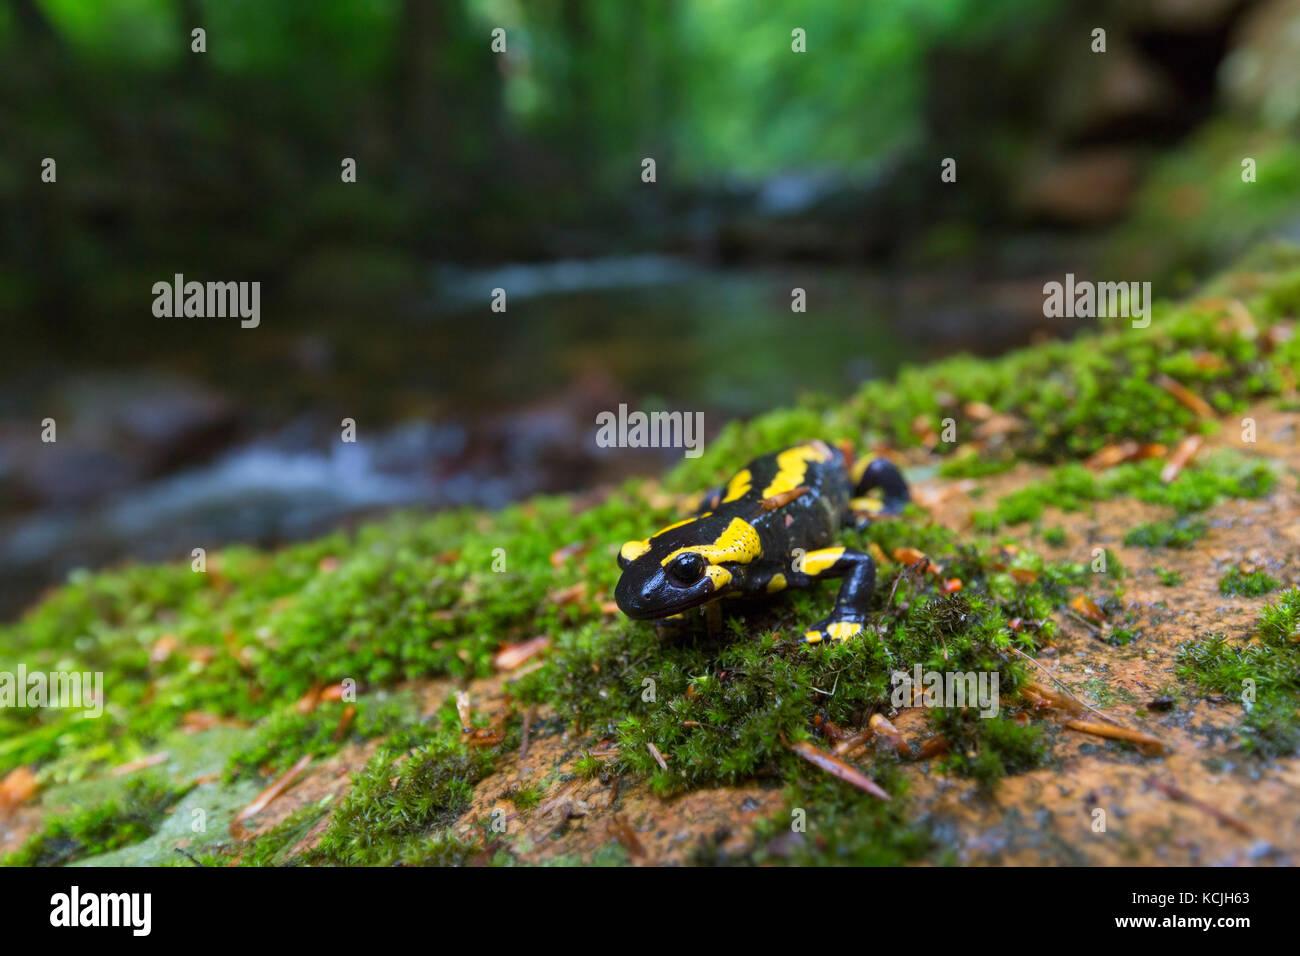 European salamander / Fire salamander (Salamandra salamandra) near stream in forest - Stock Image